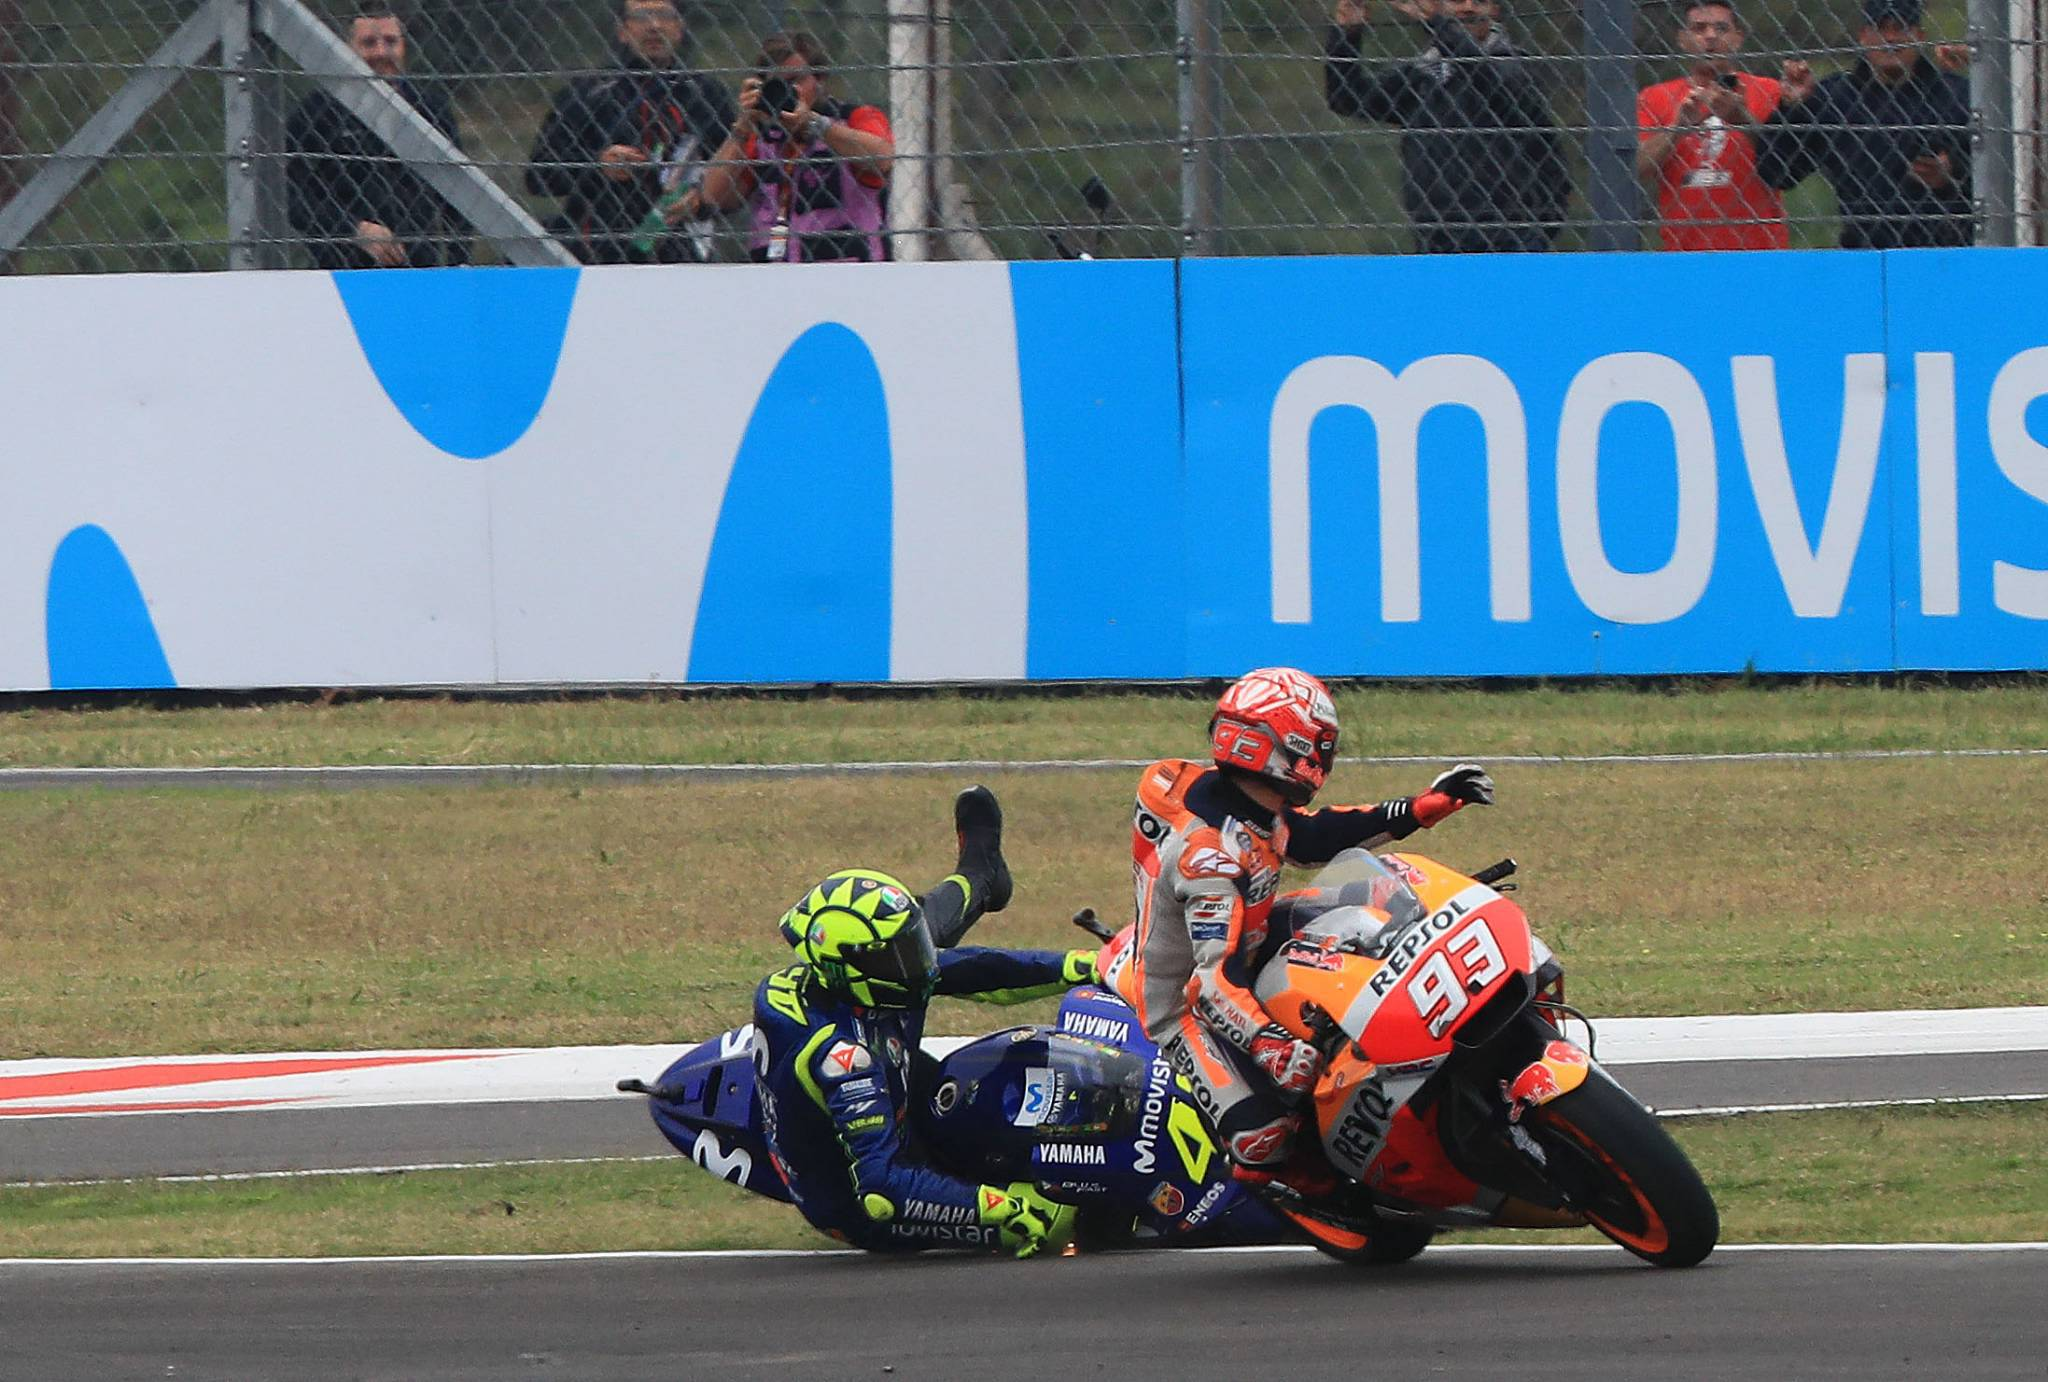 Honda  Жалиме поради ситуацијата меѓу Роси и Маркез